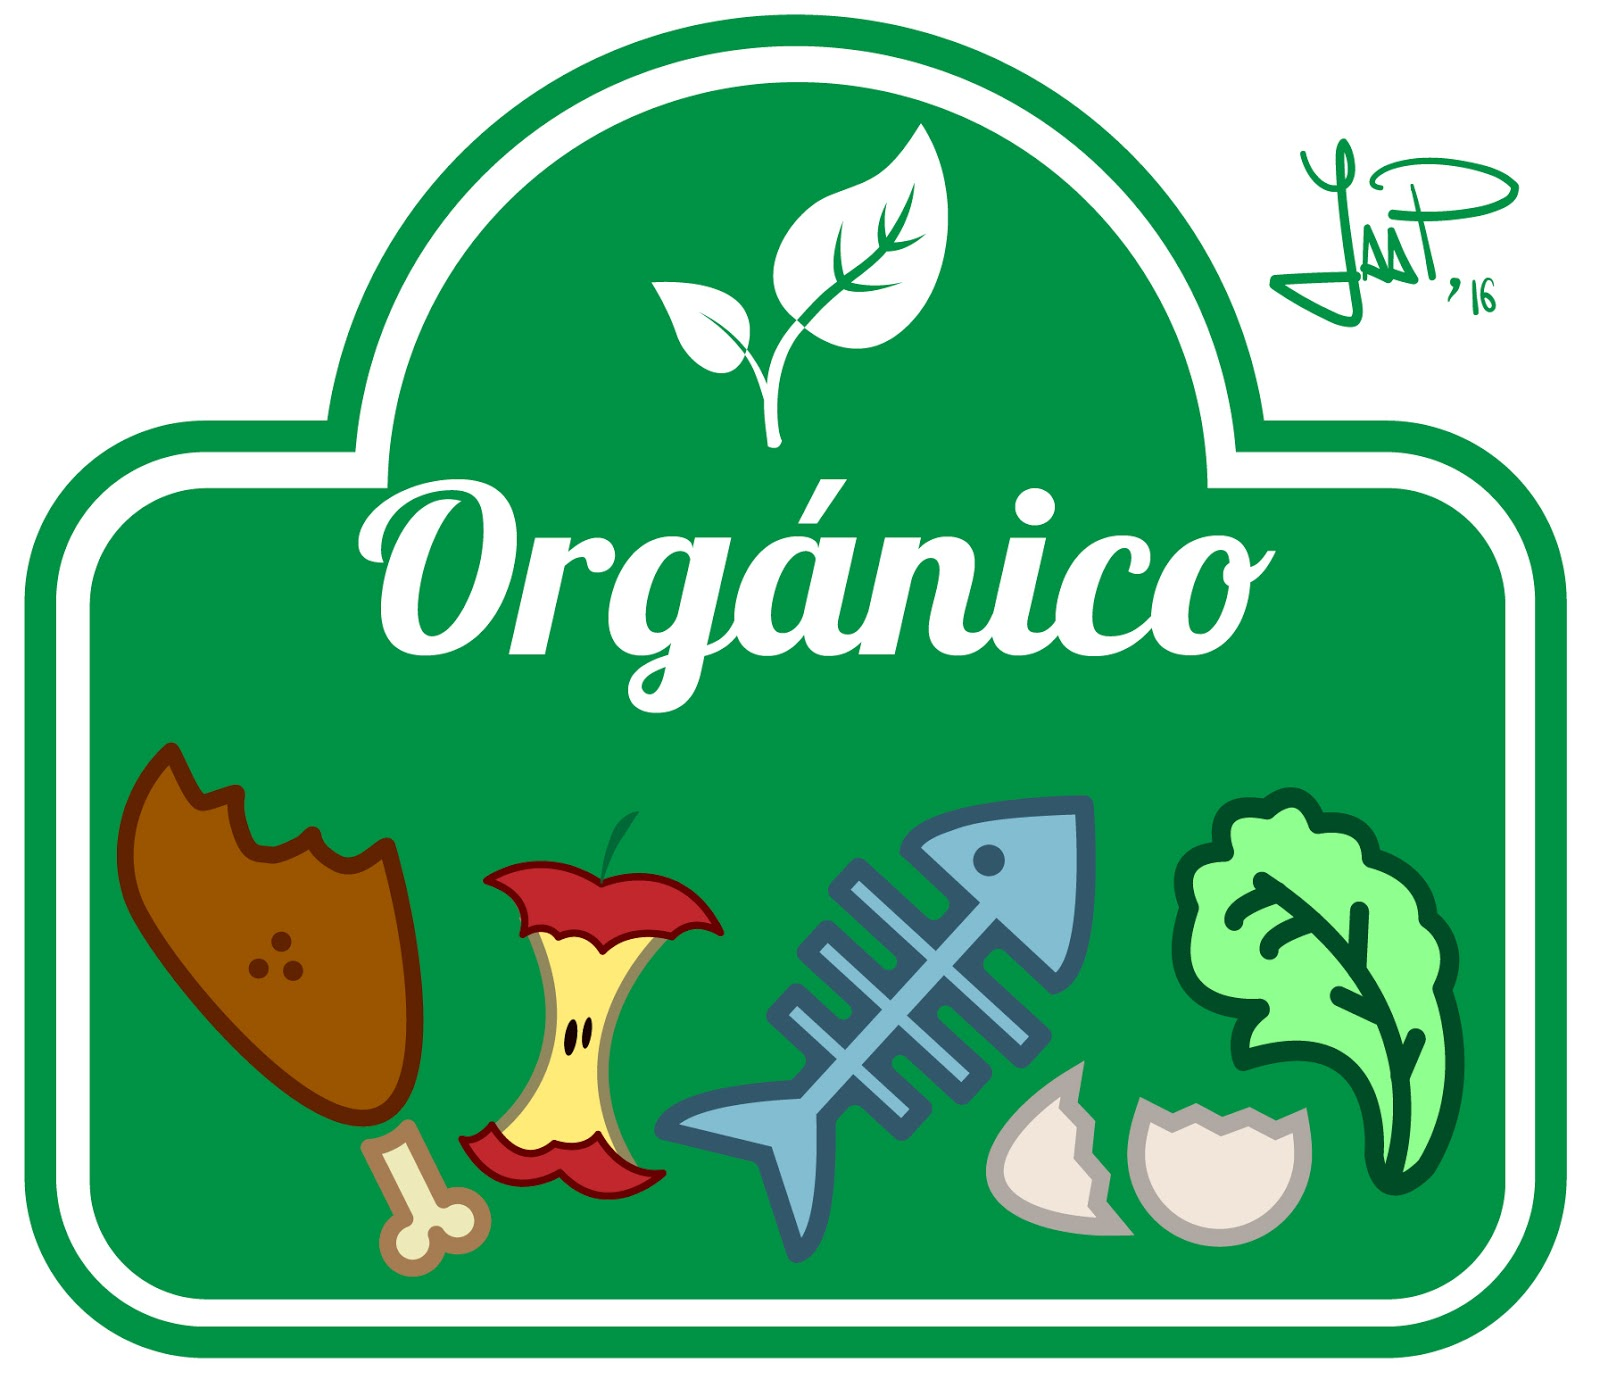 Inorganico Dibujos De Reciclaje Wwwmiifotoscom